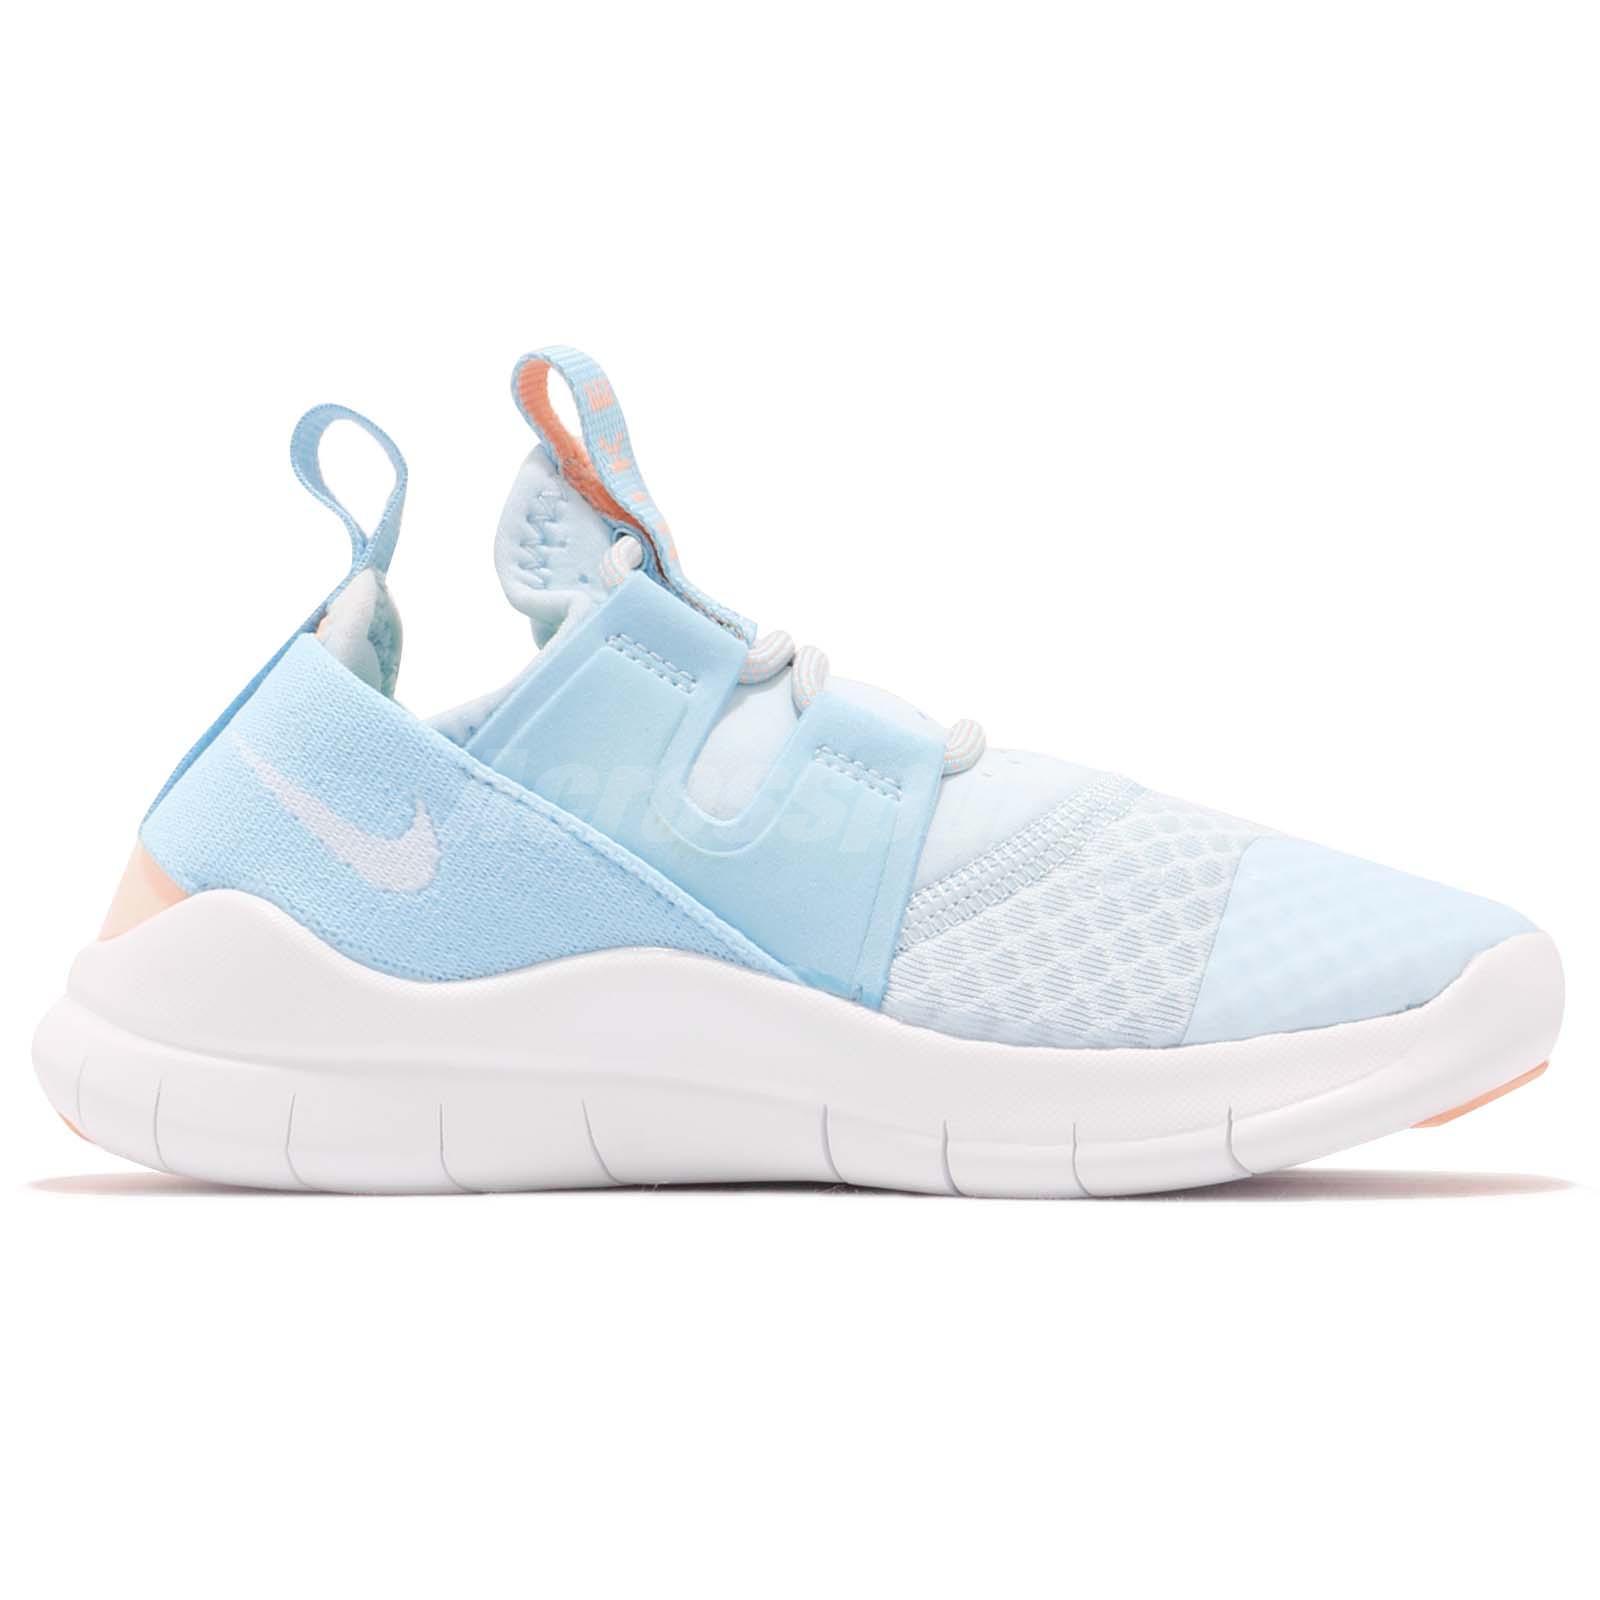 9847e8c886967 Nike Free RN CMTR 2018 PS White Blue Preschool Boy Girl Running ...